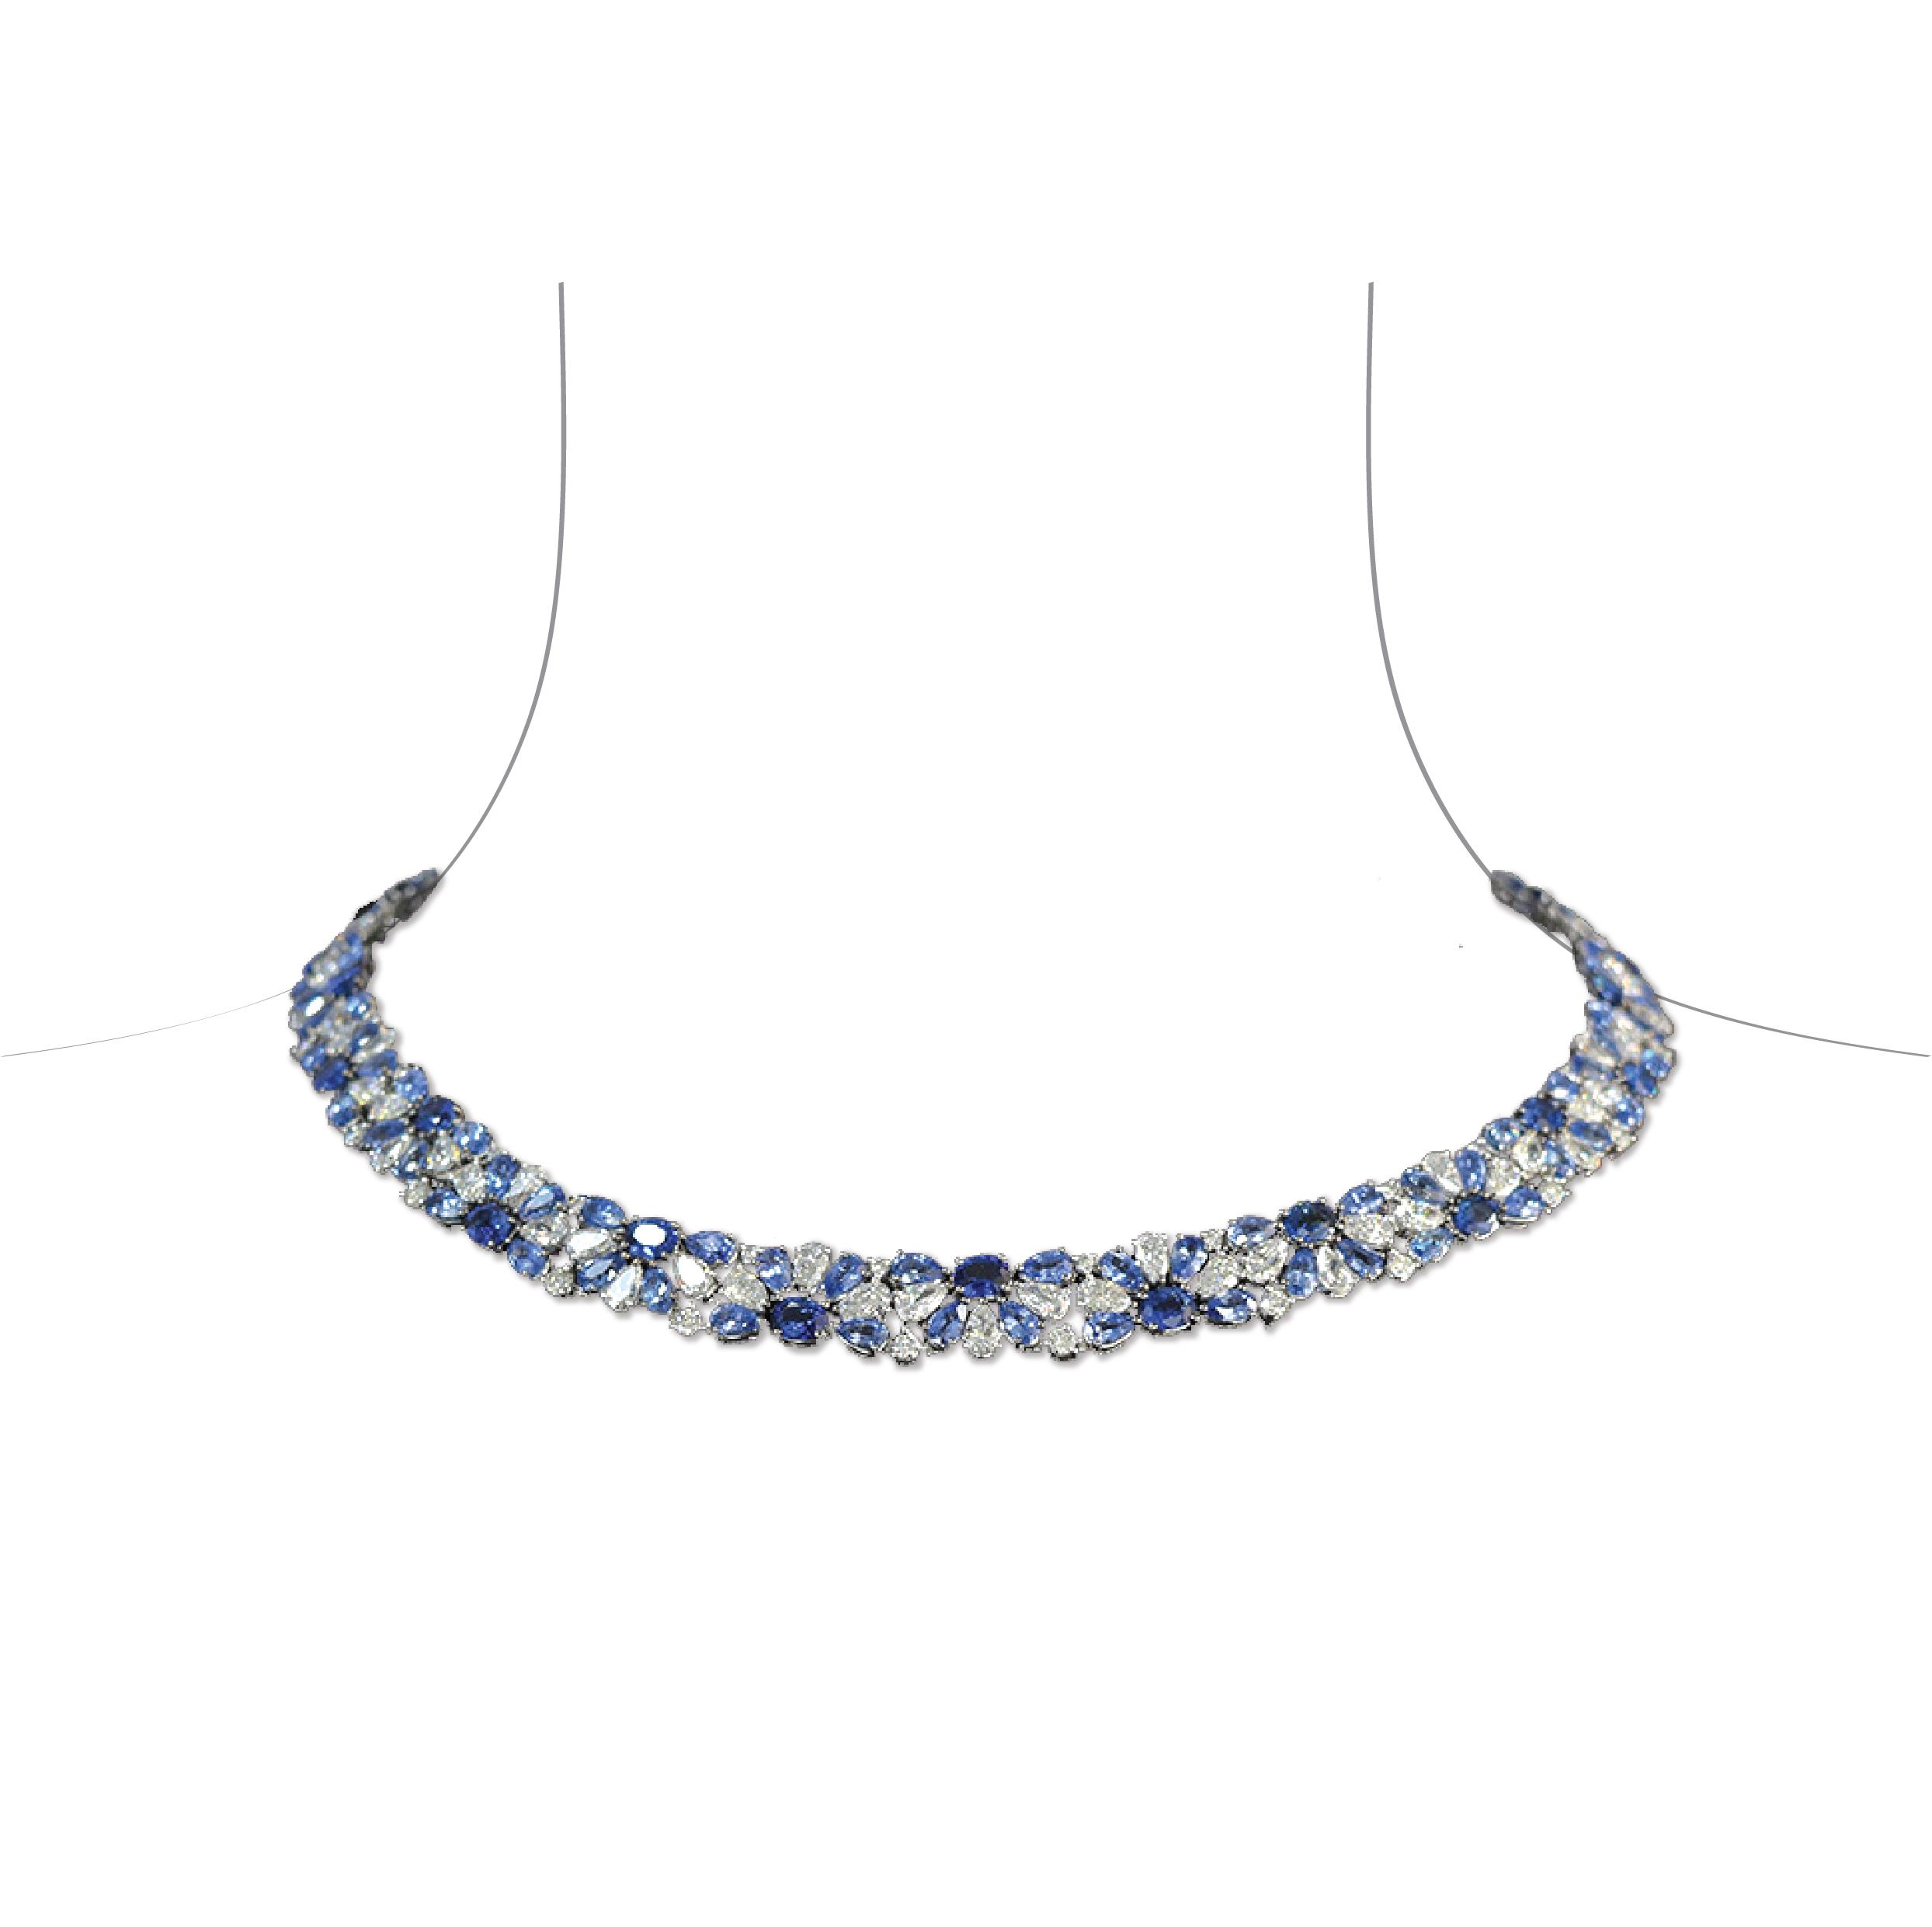 Collier saphirs diamants or blanc